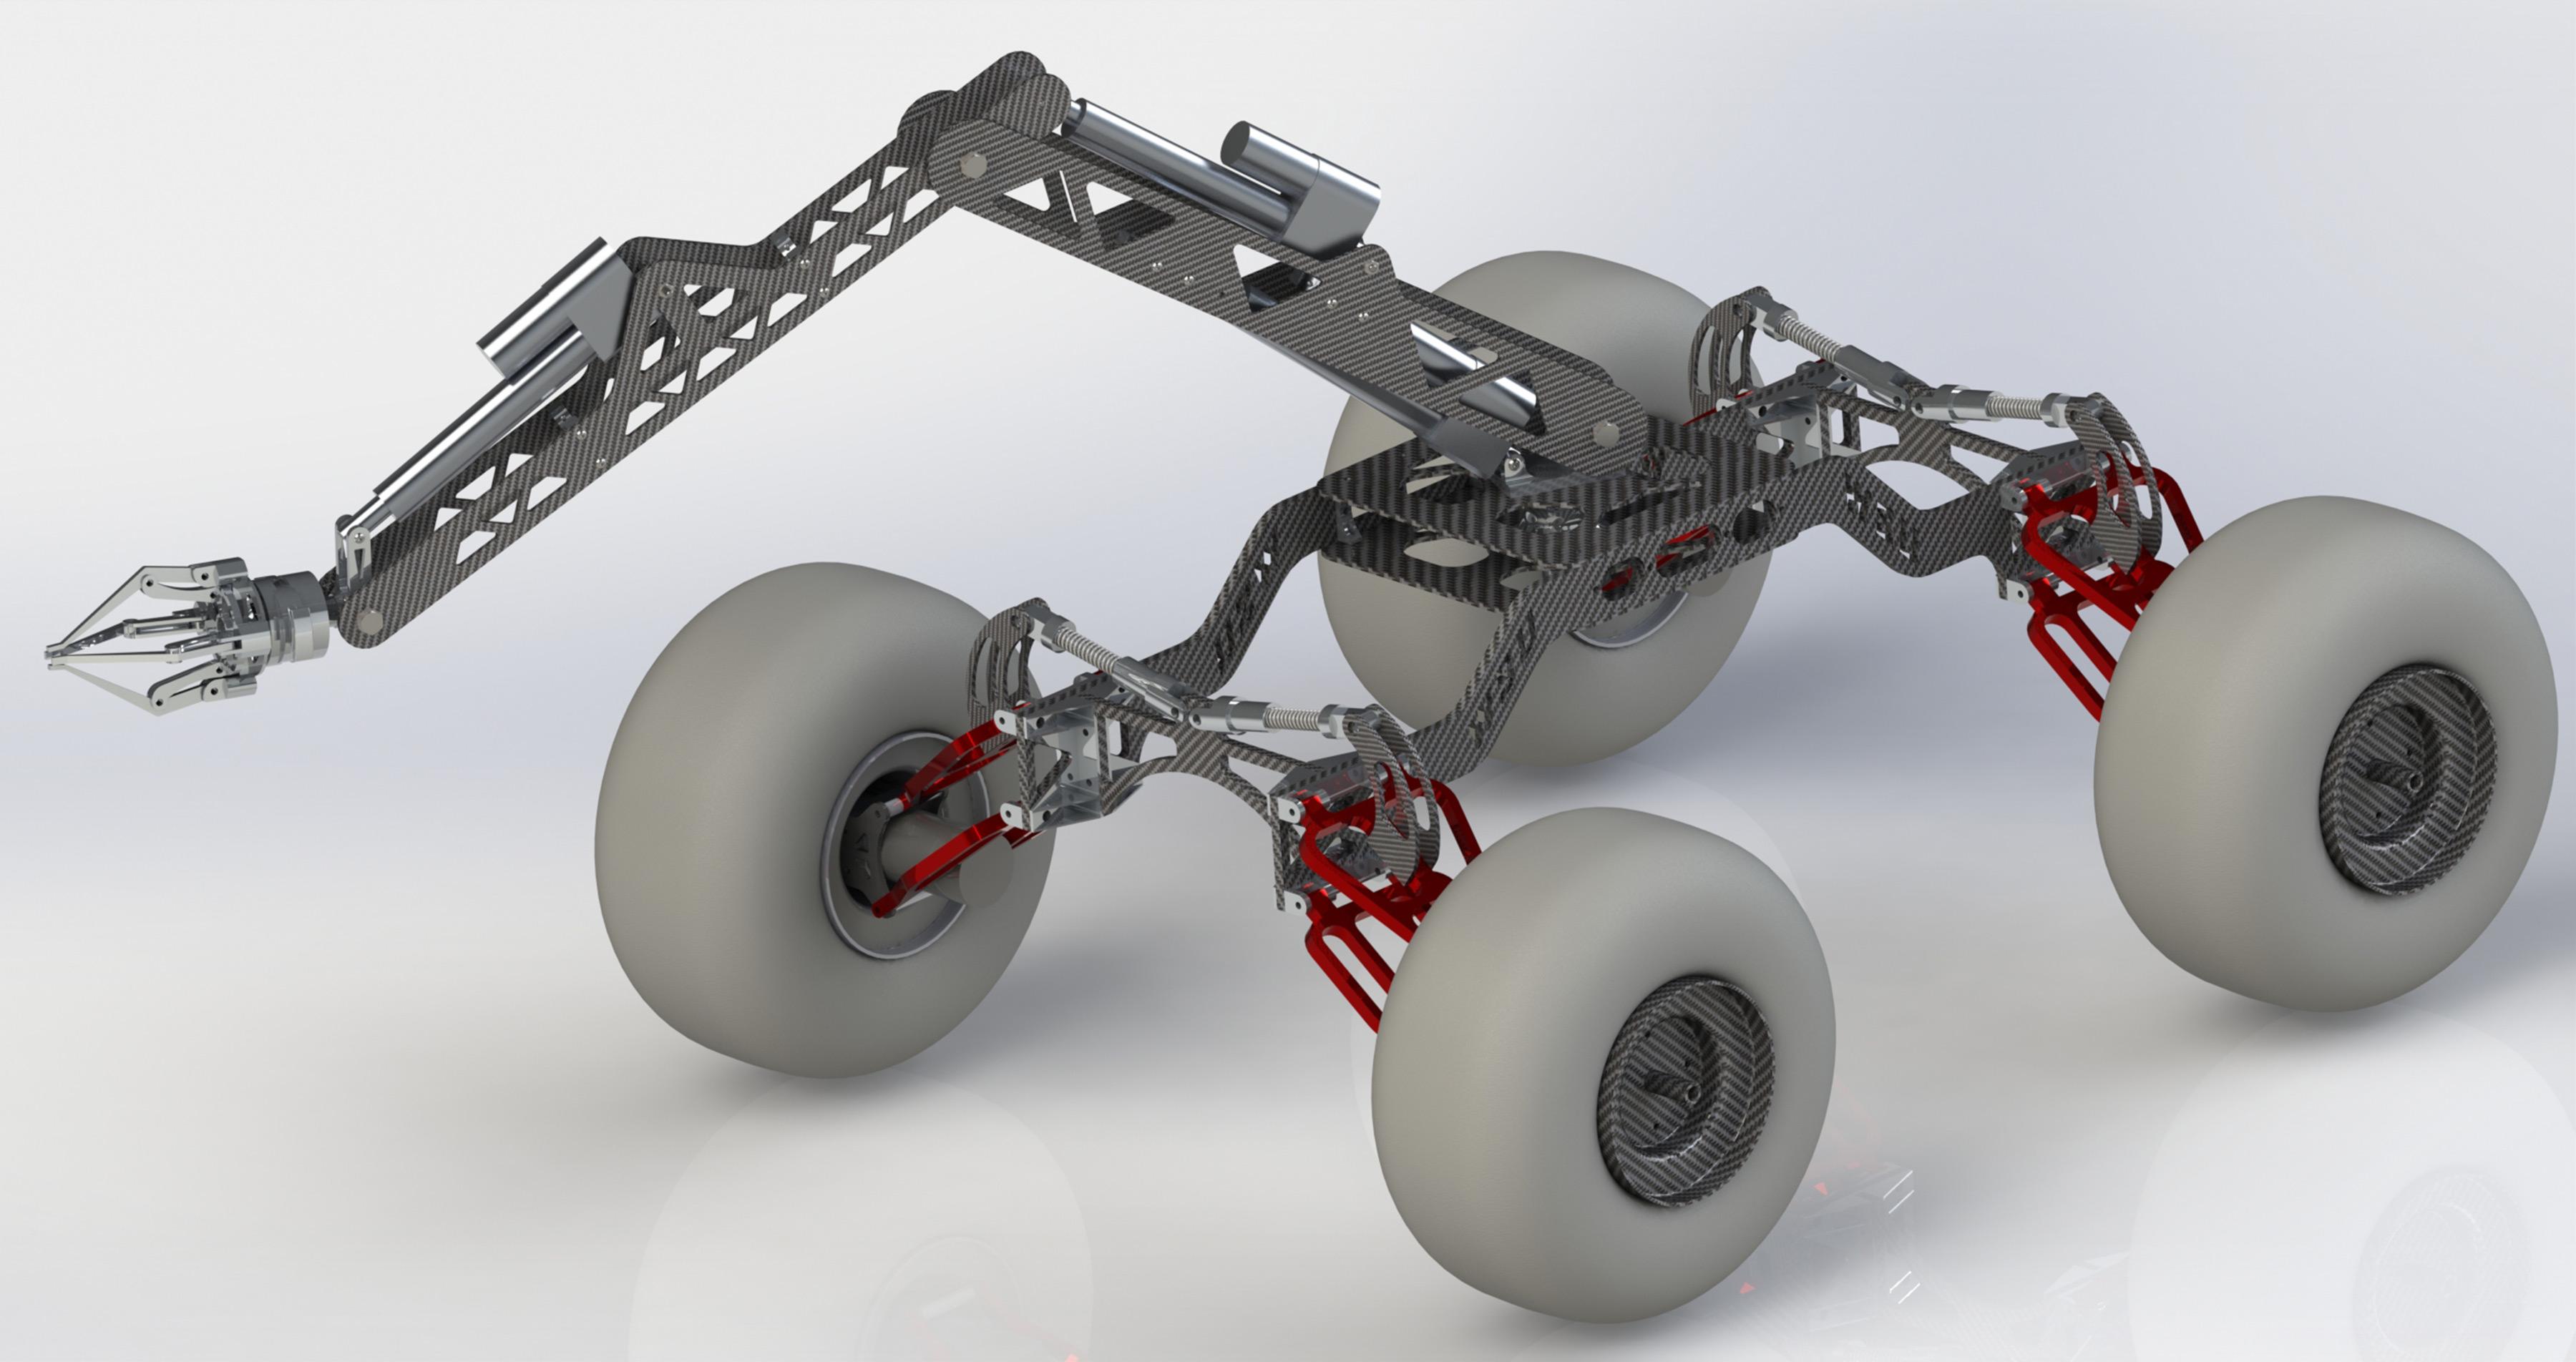 mars exploration rover design - photo #8